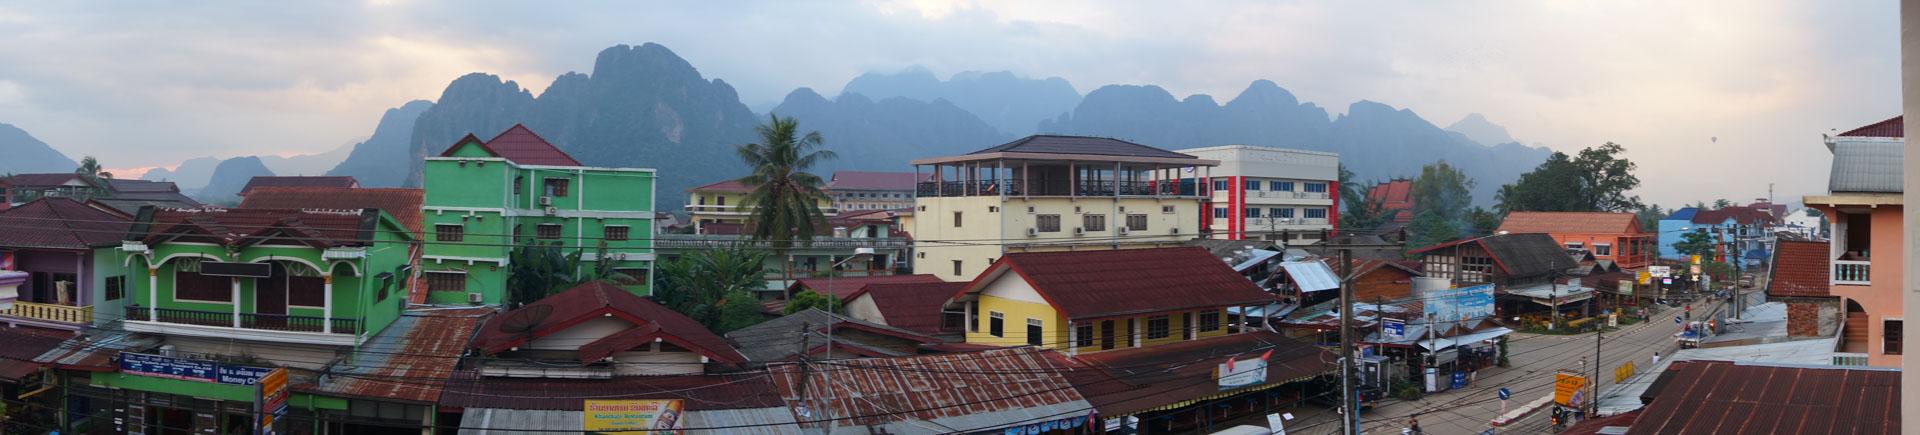 Vang Vieng Panorama